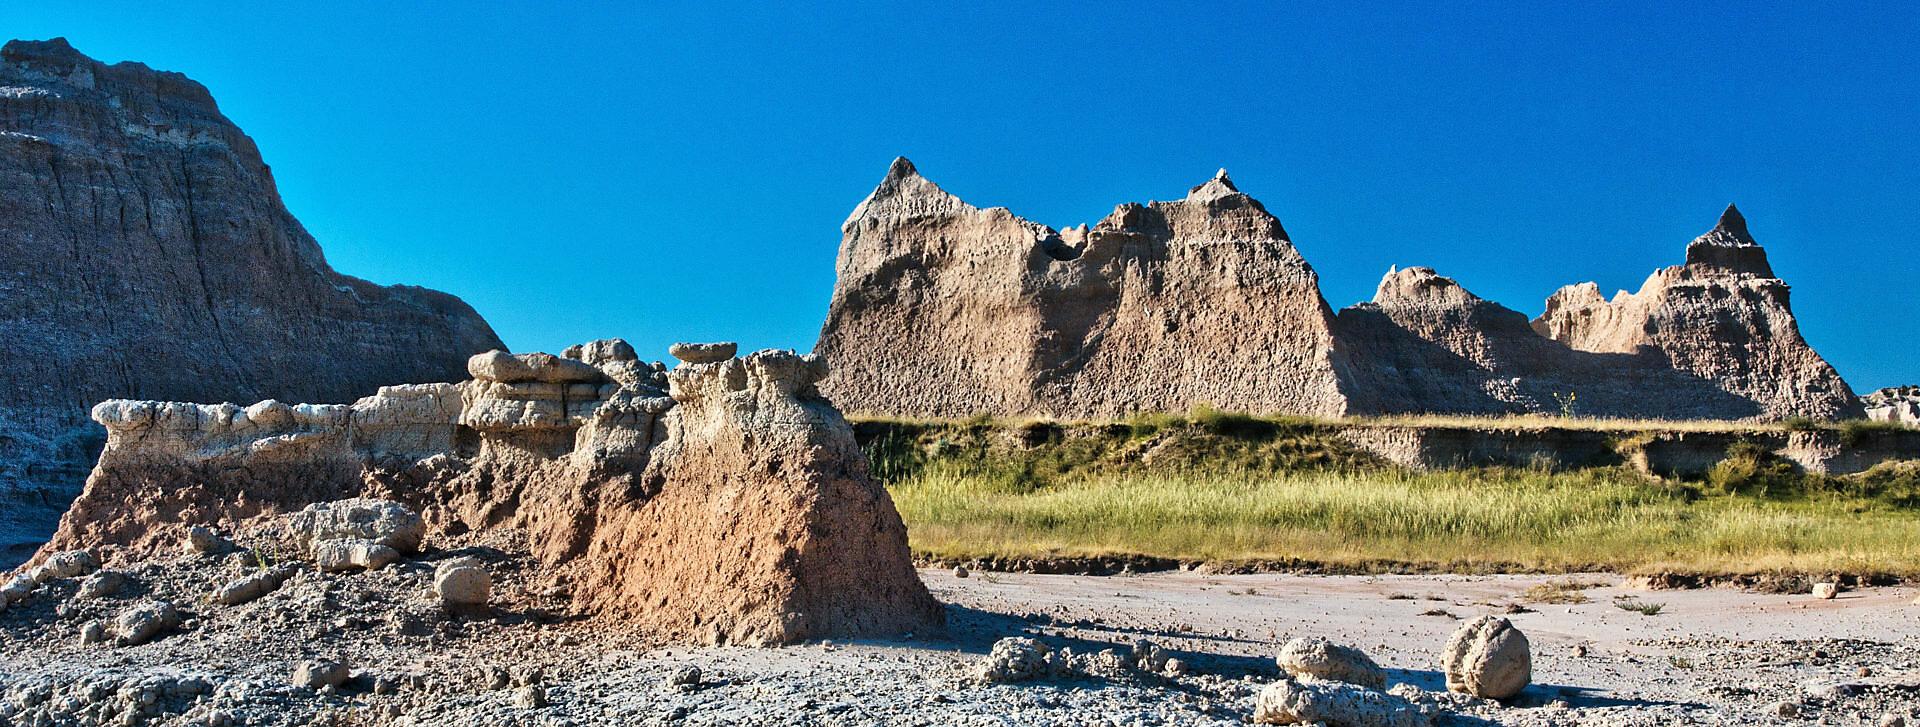 South Dakota, Badlands National Park, Felsformation, Ebene